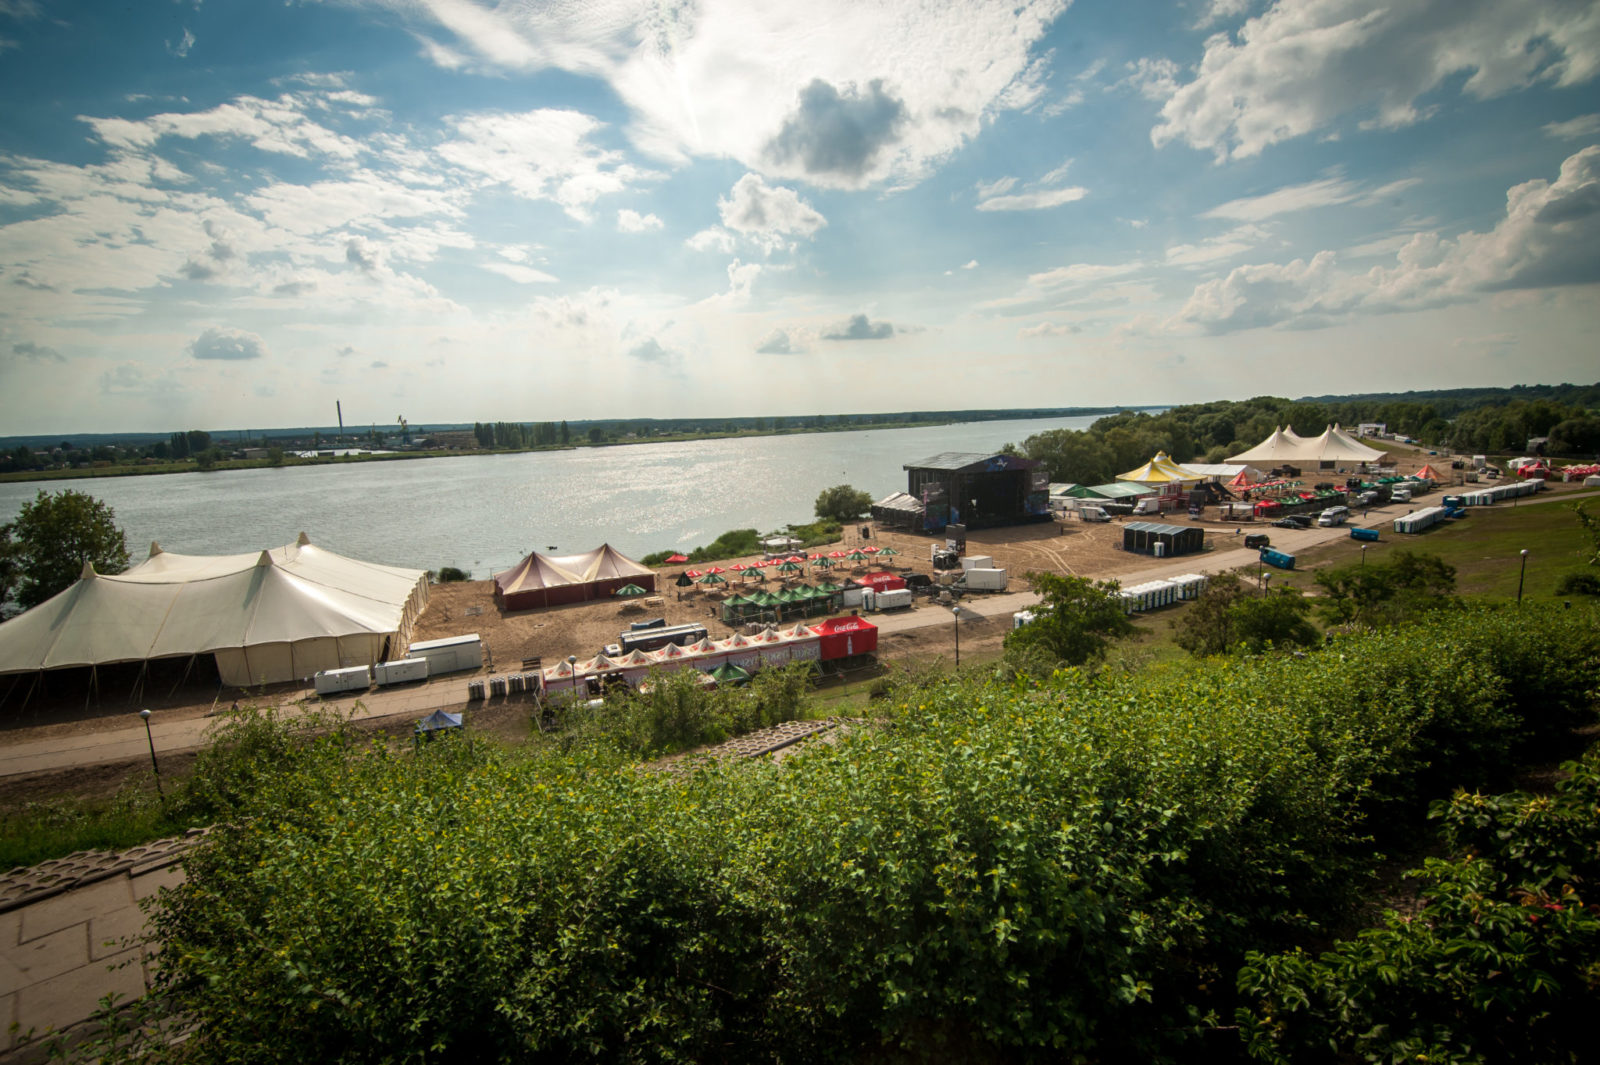 Widok na teren festiwalu Audioriver